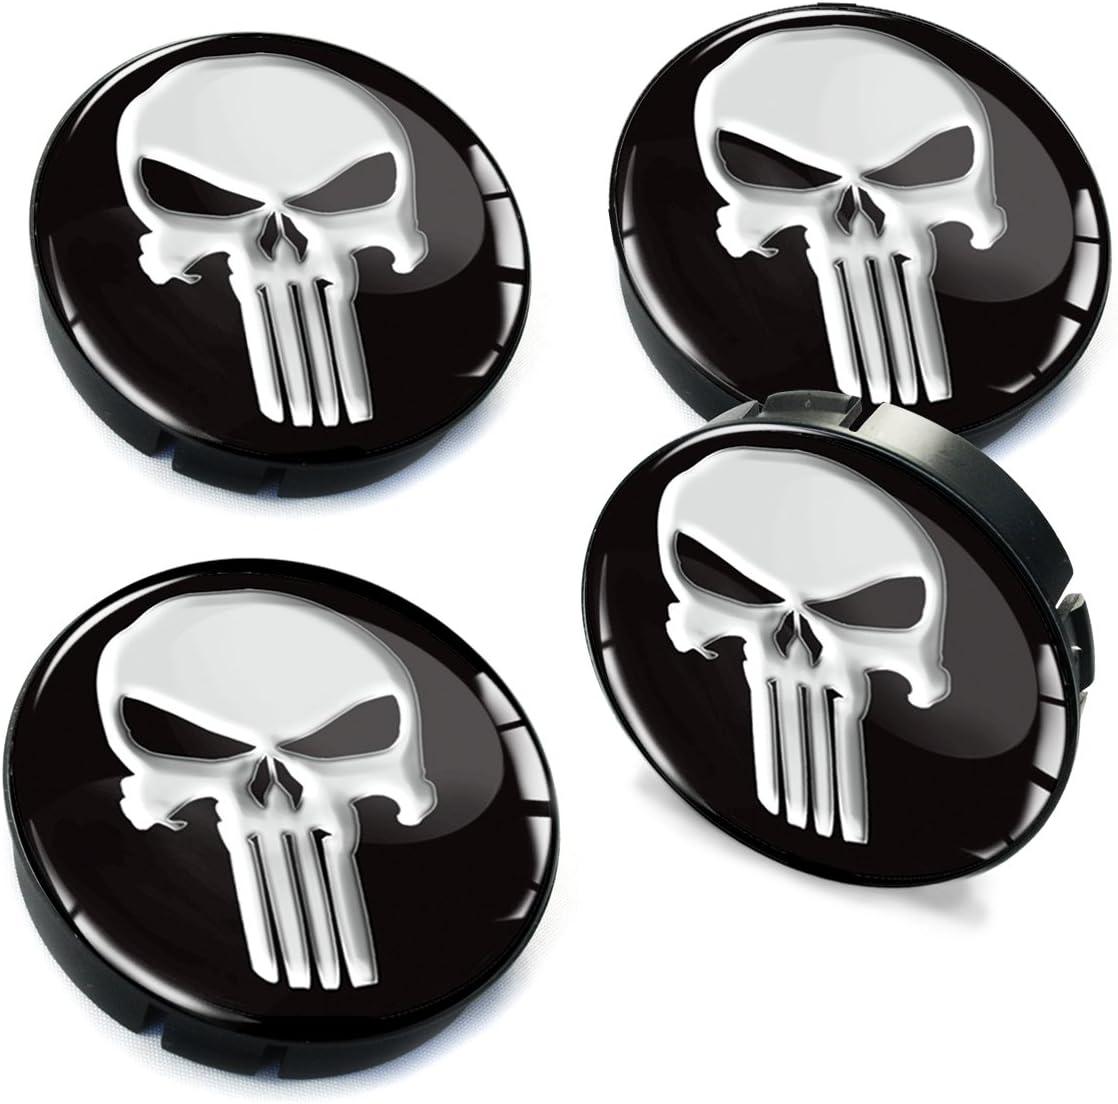 Skinoeu 4 X 60mm Silikon Nabenkappen Kappen Punisher Totenkopf Totenschädel Skull Felgendeckel Radkappen Radnabendeckel Nabendeckel Auto Tuning C 1 Auto